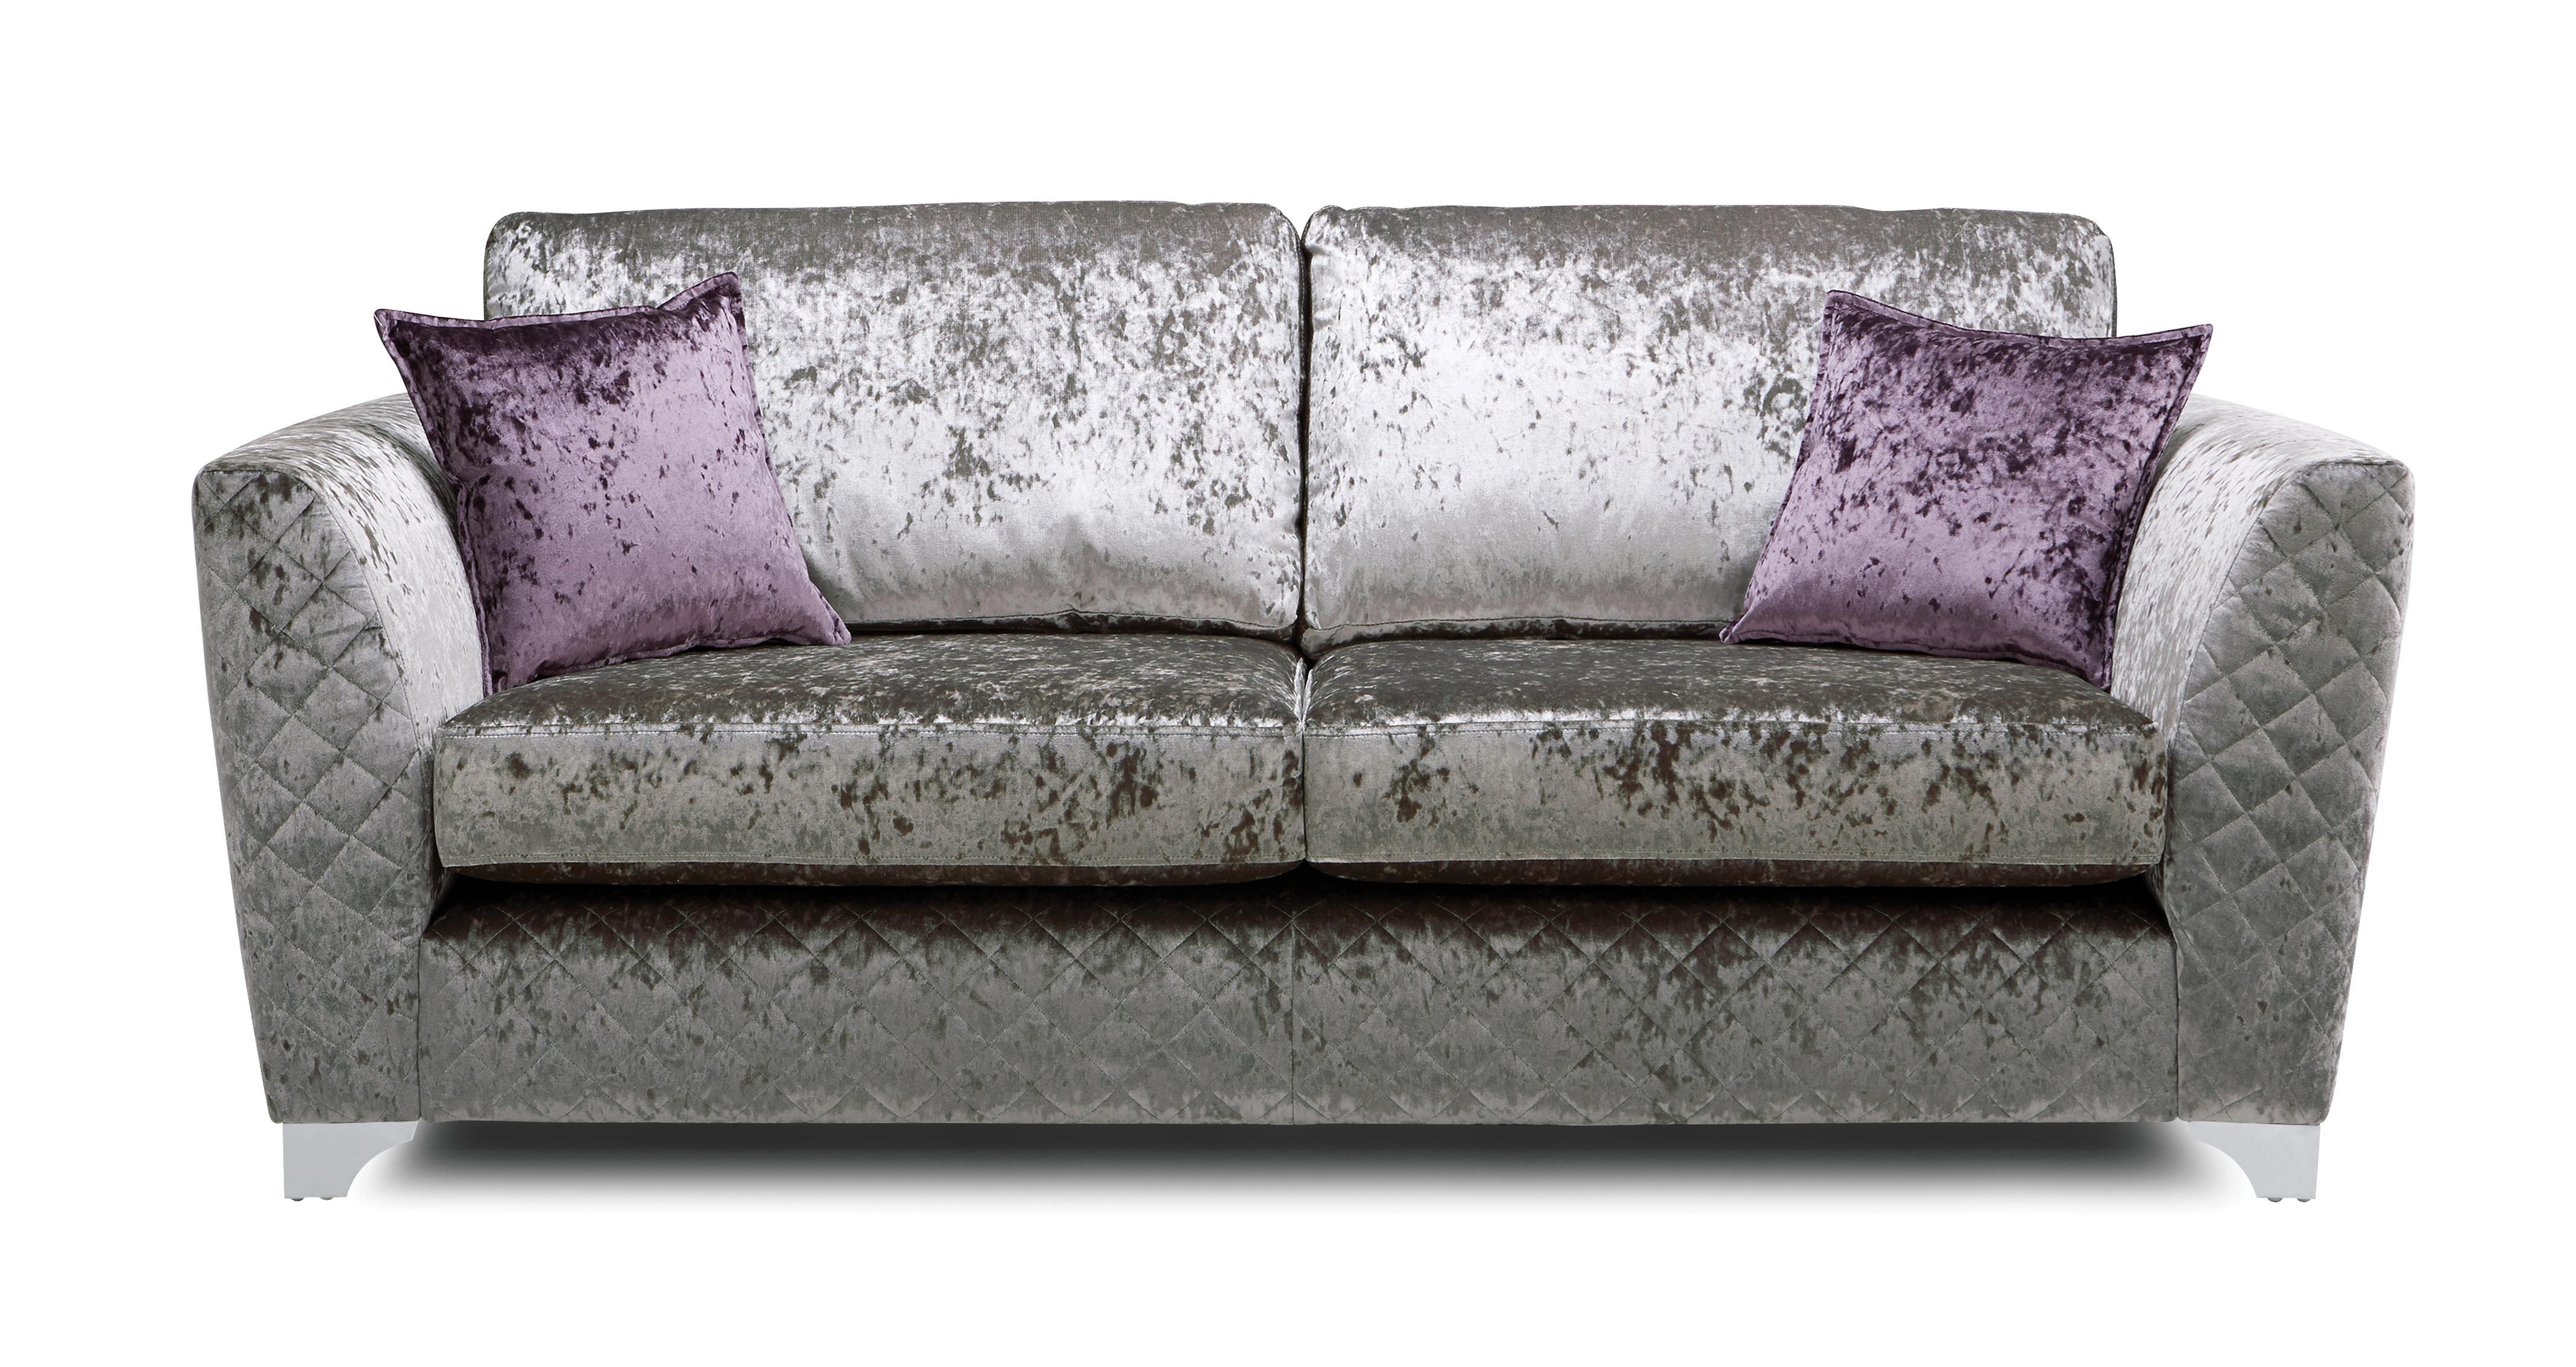 panache dog sofa leather futon sleeper gradschoolfairs